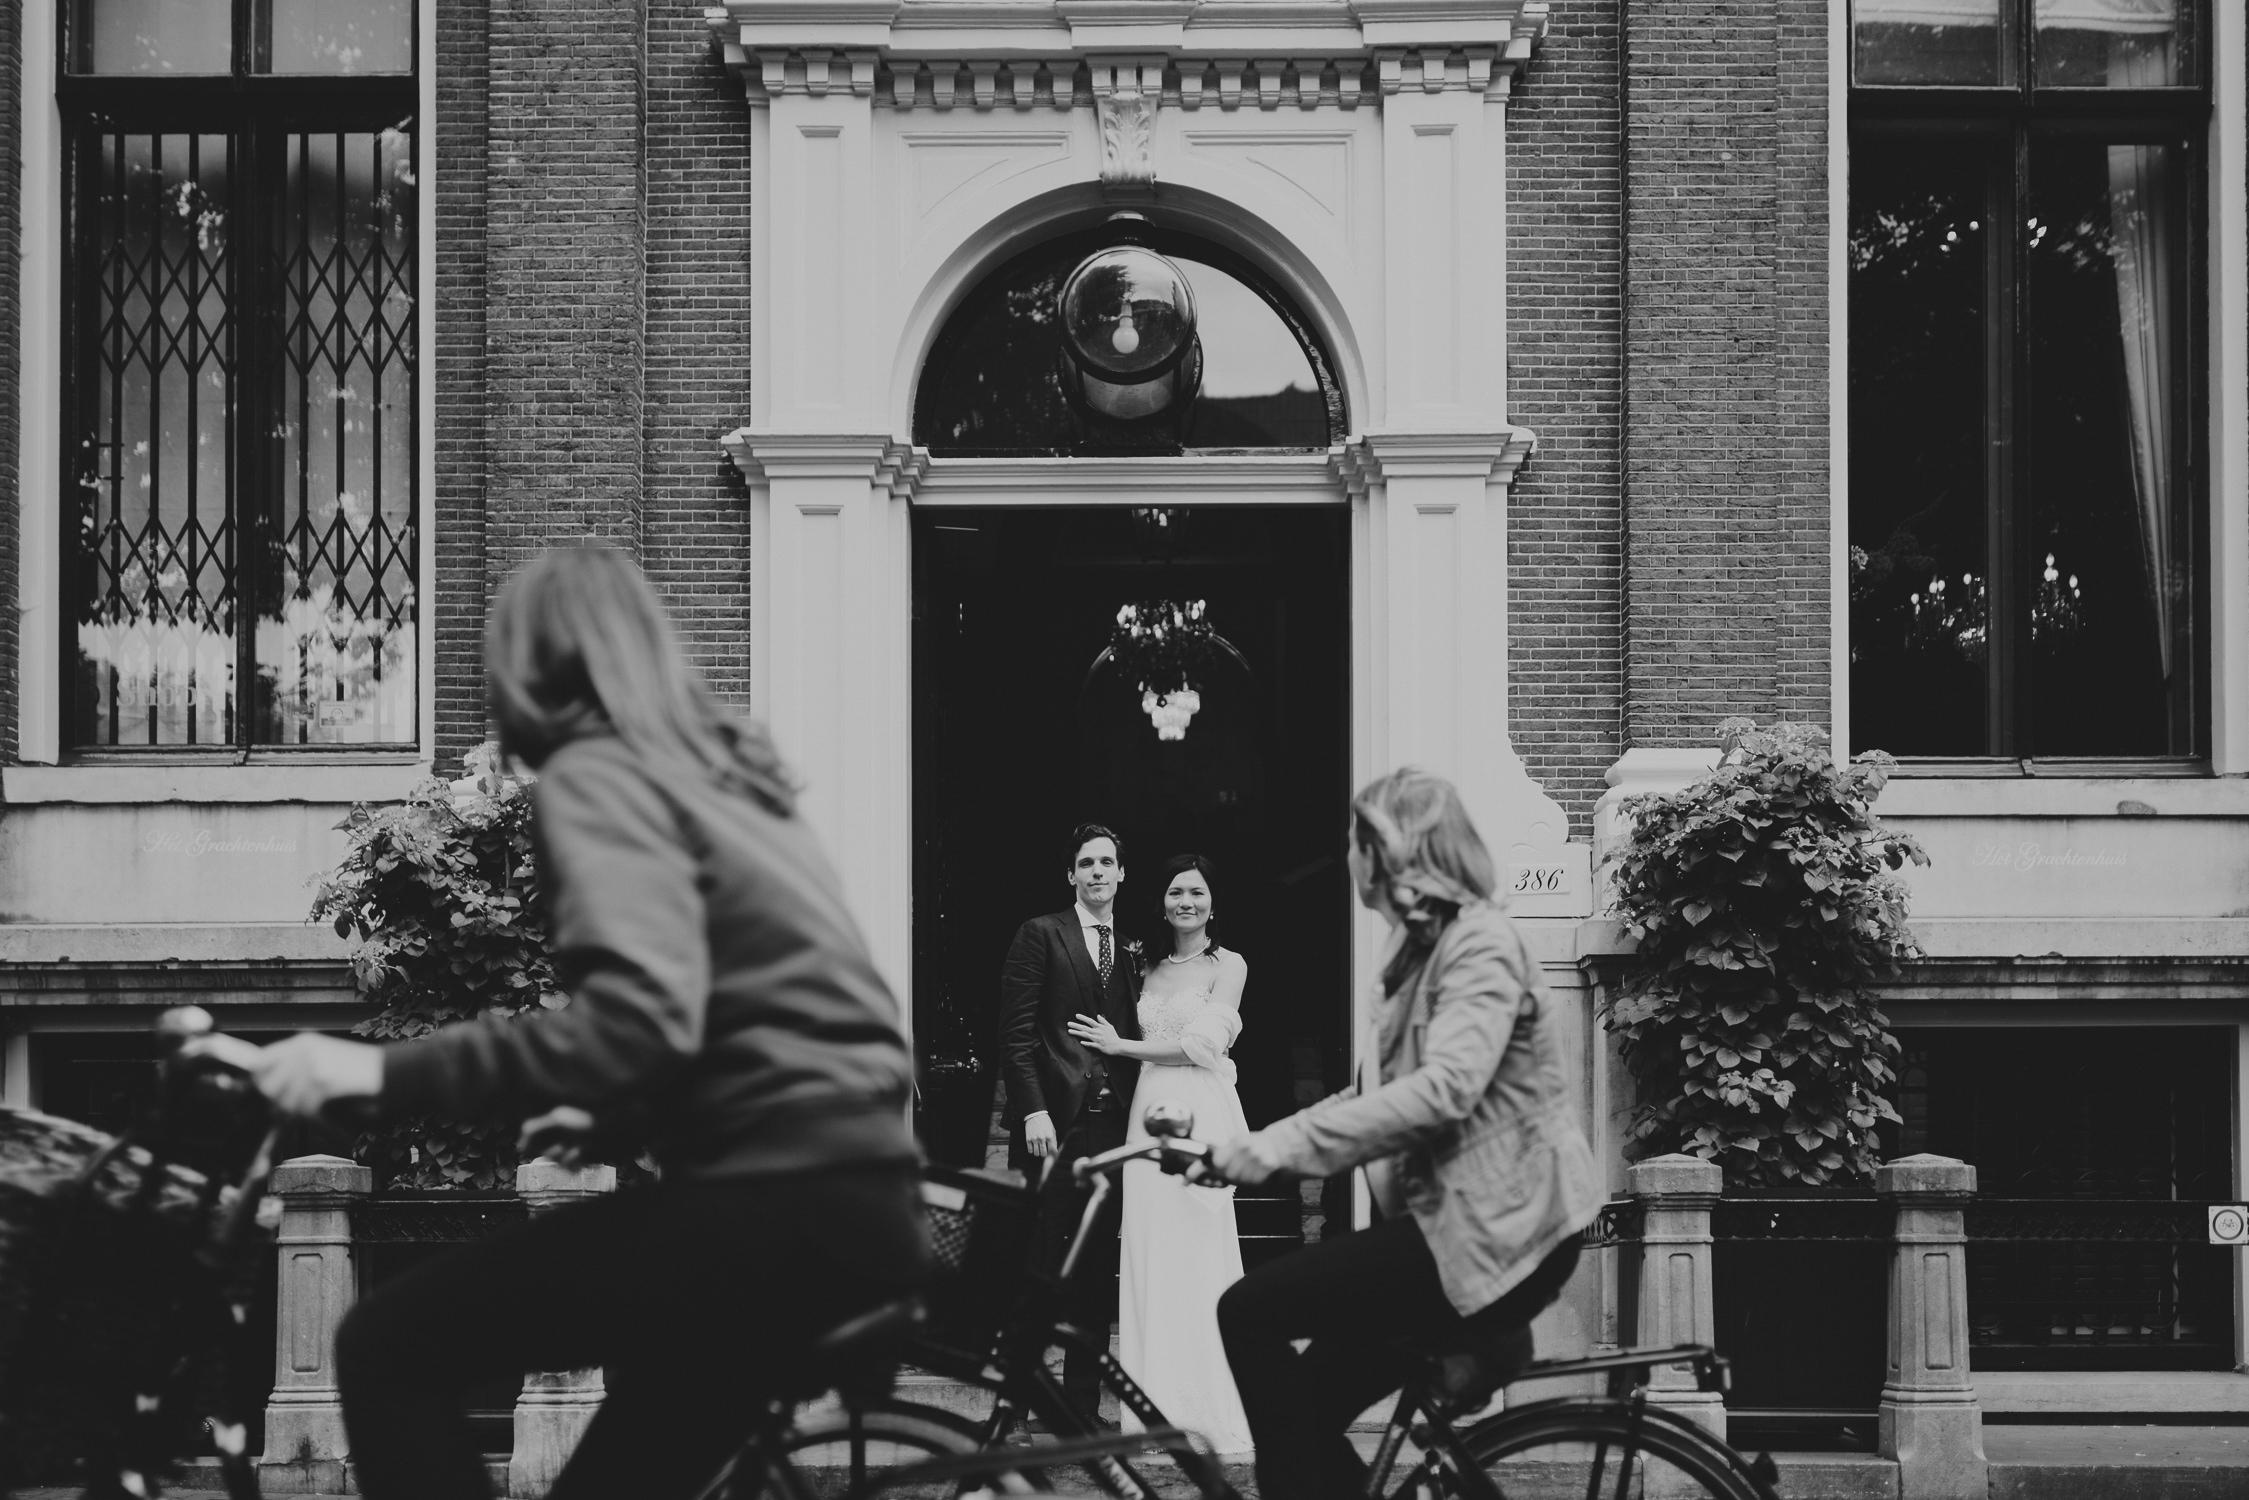 bruidsfotografie-amsterdam-utrecht-trouwfotograaf-mark-hadden-wedding-photography-mike-helen-376.jpg